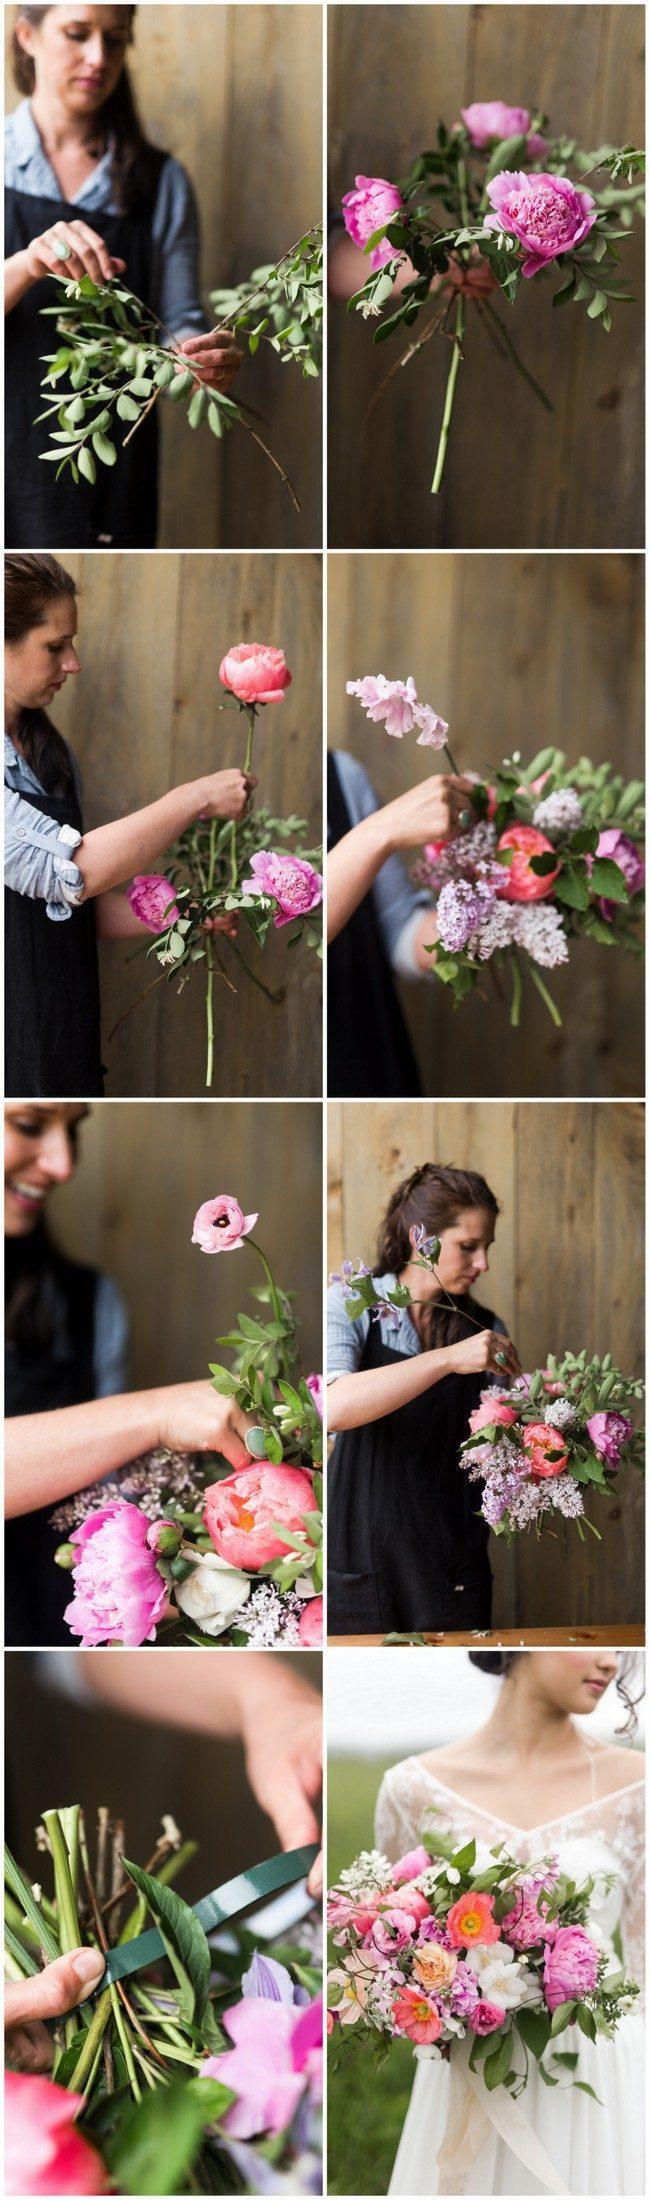 Hand tied garden bouquet tutorial